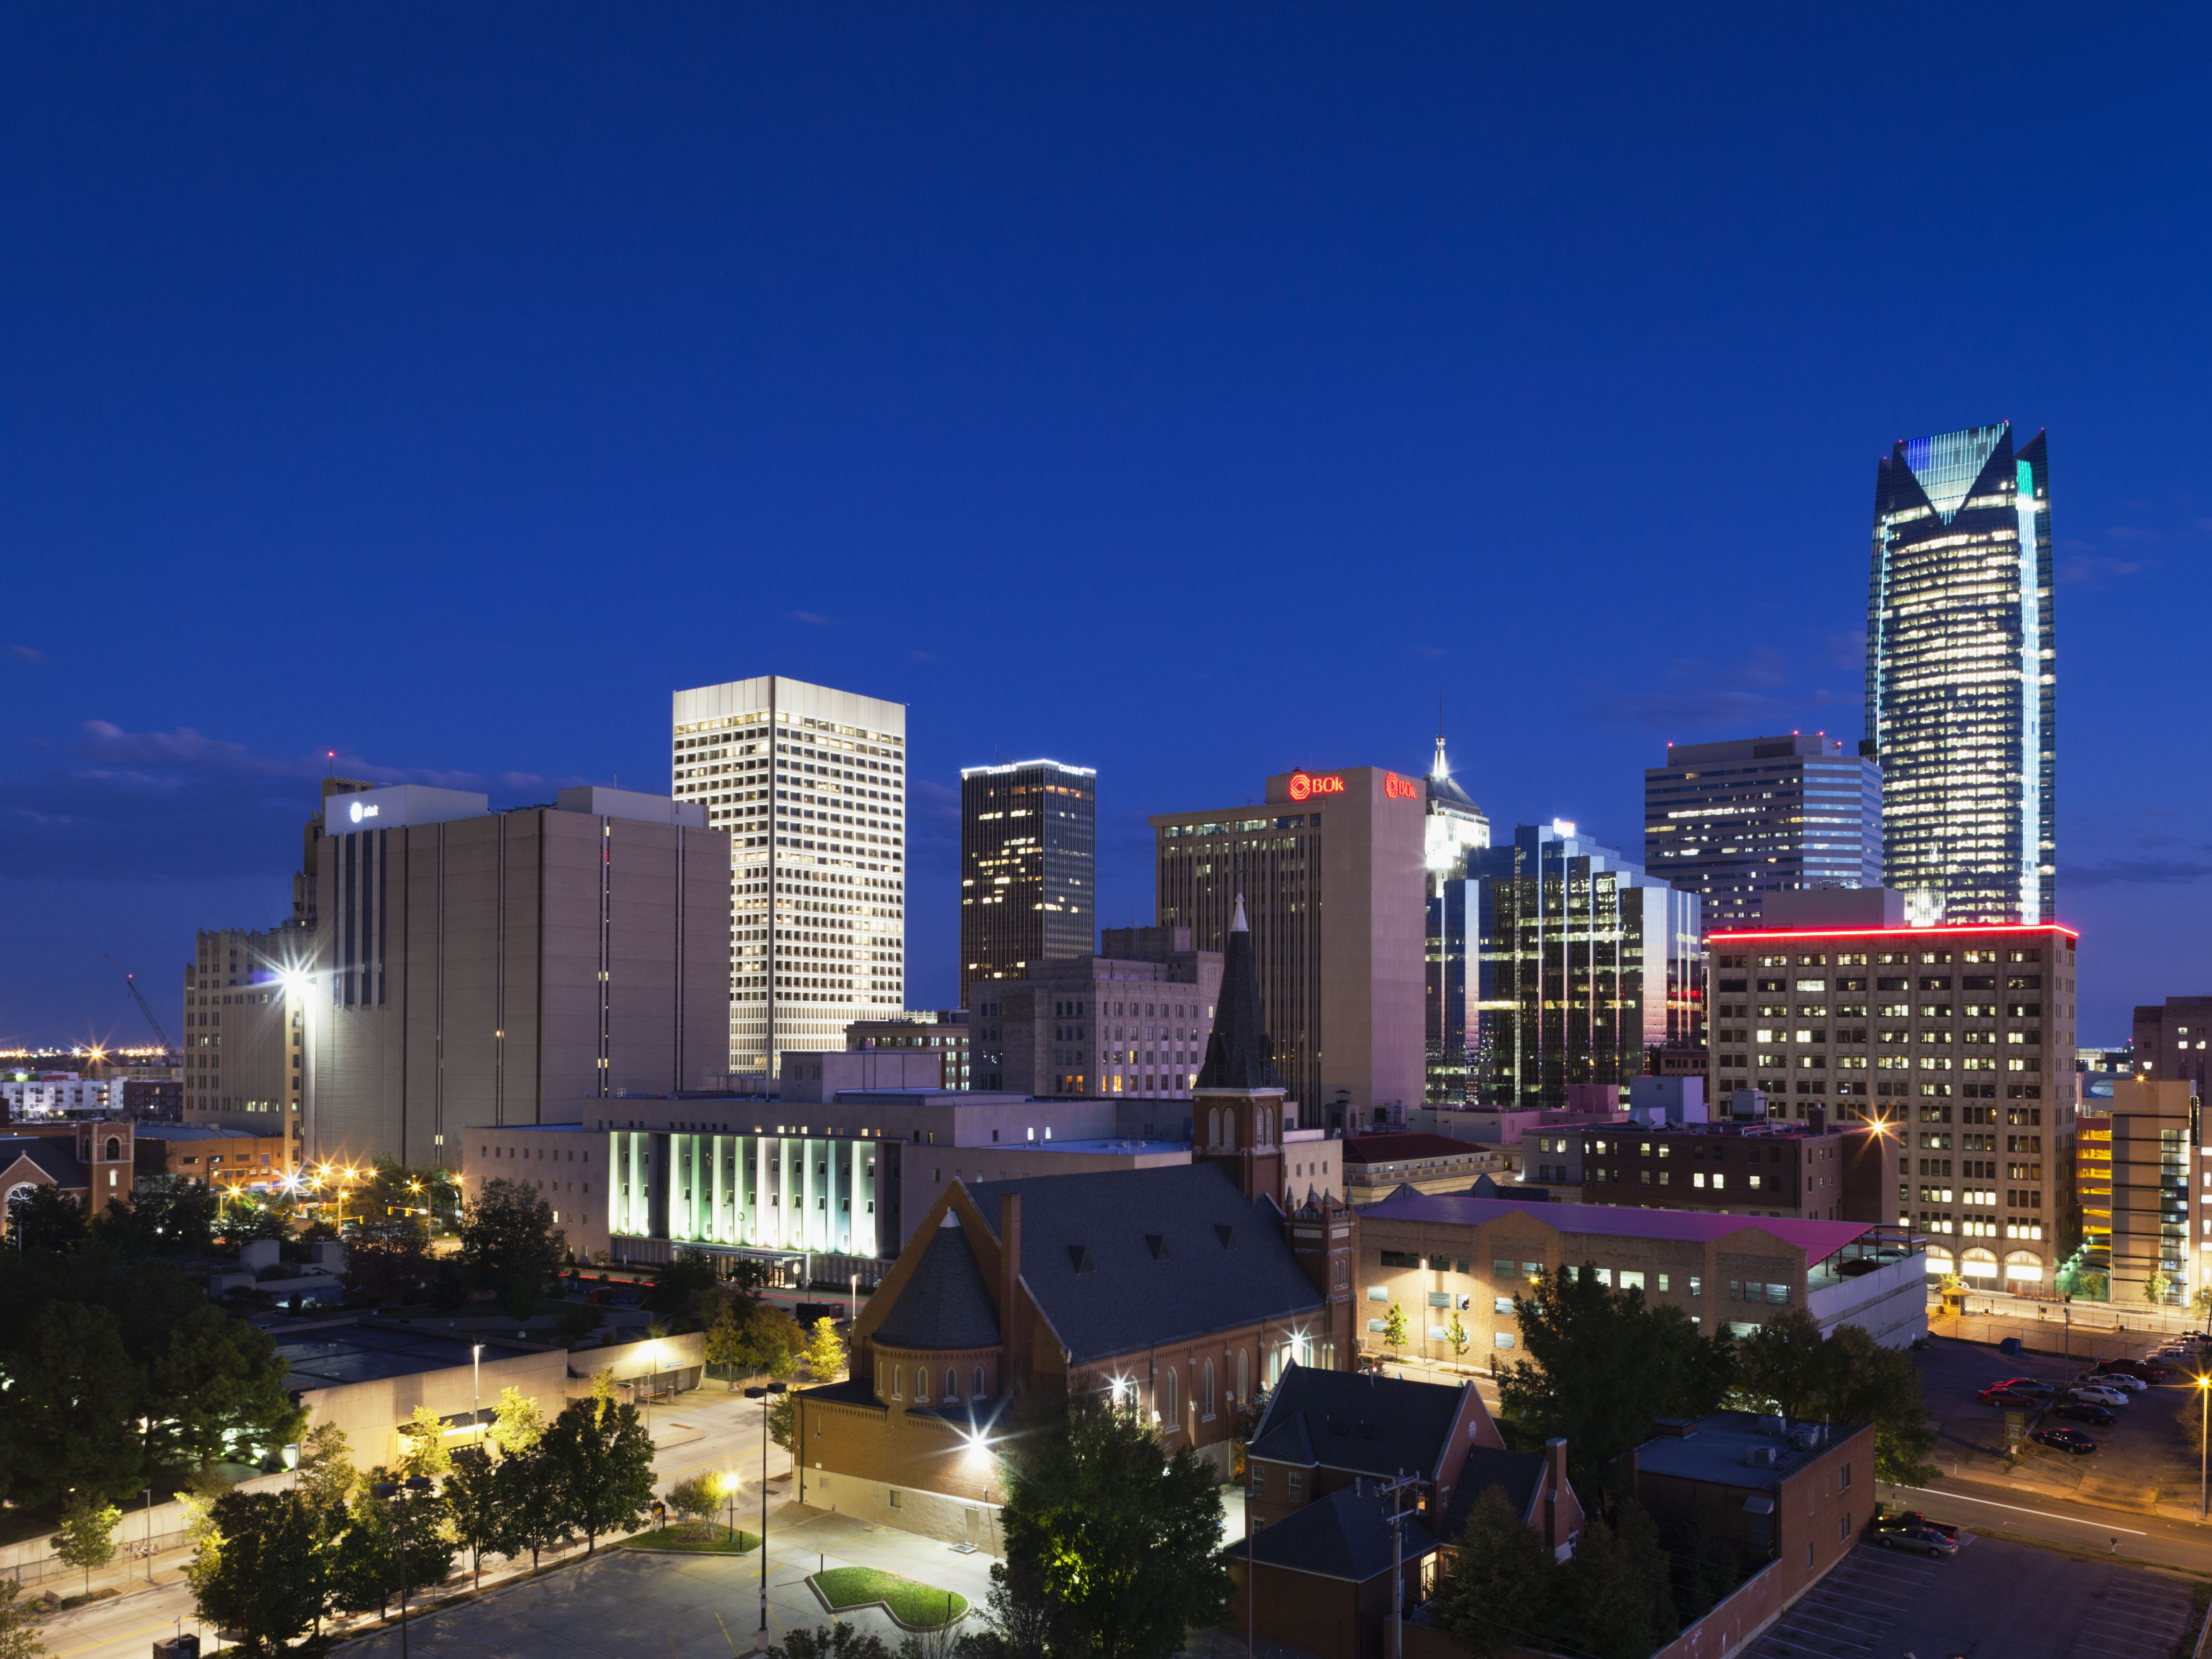 Tulsa Ok Time Zone >> Time Zone And Daylight Saving Information For Oklahoma